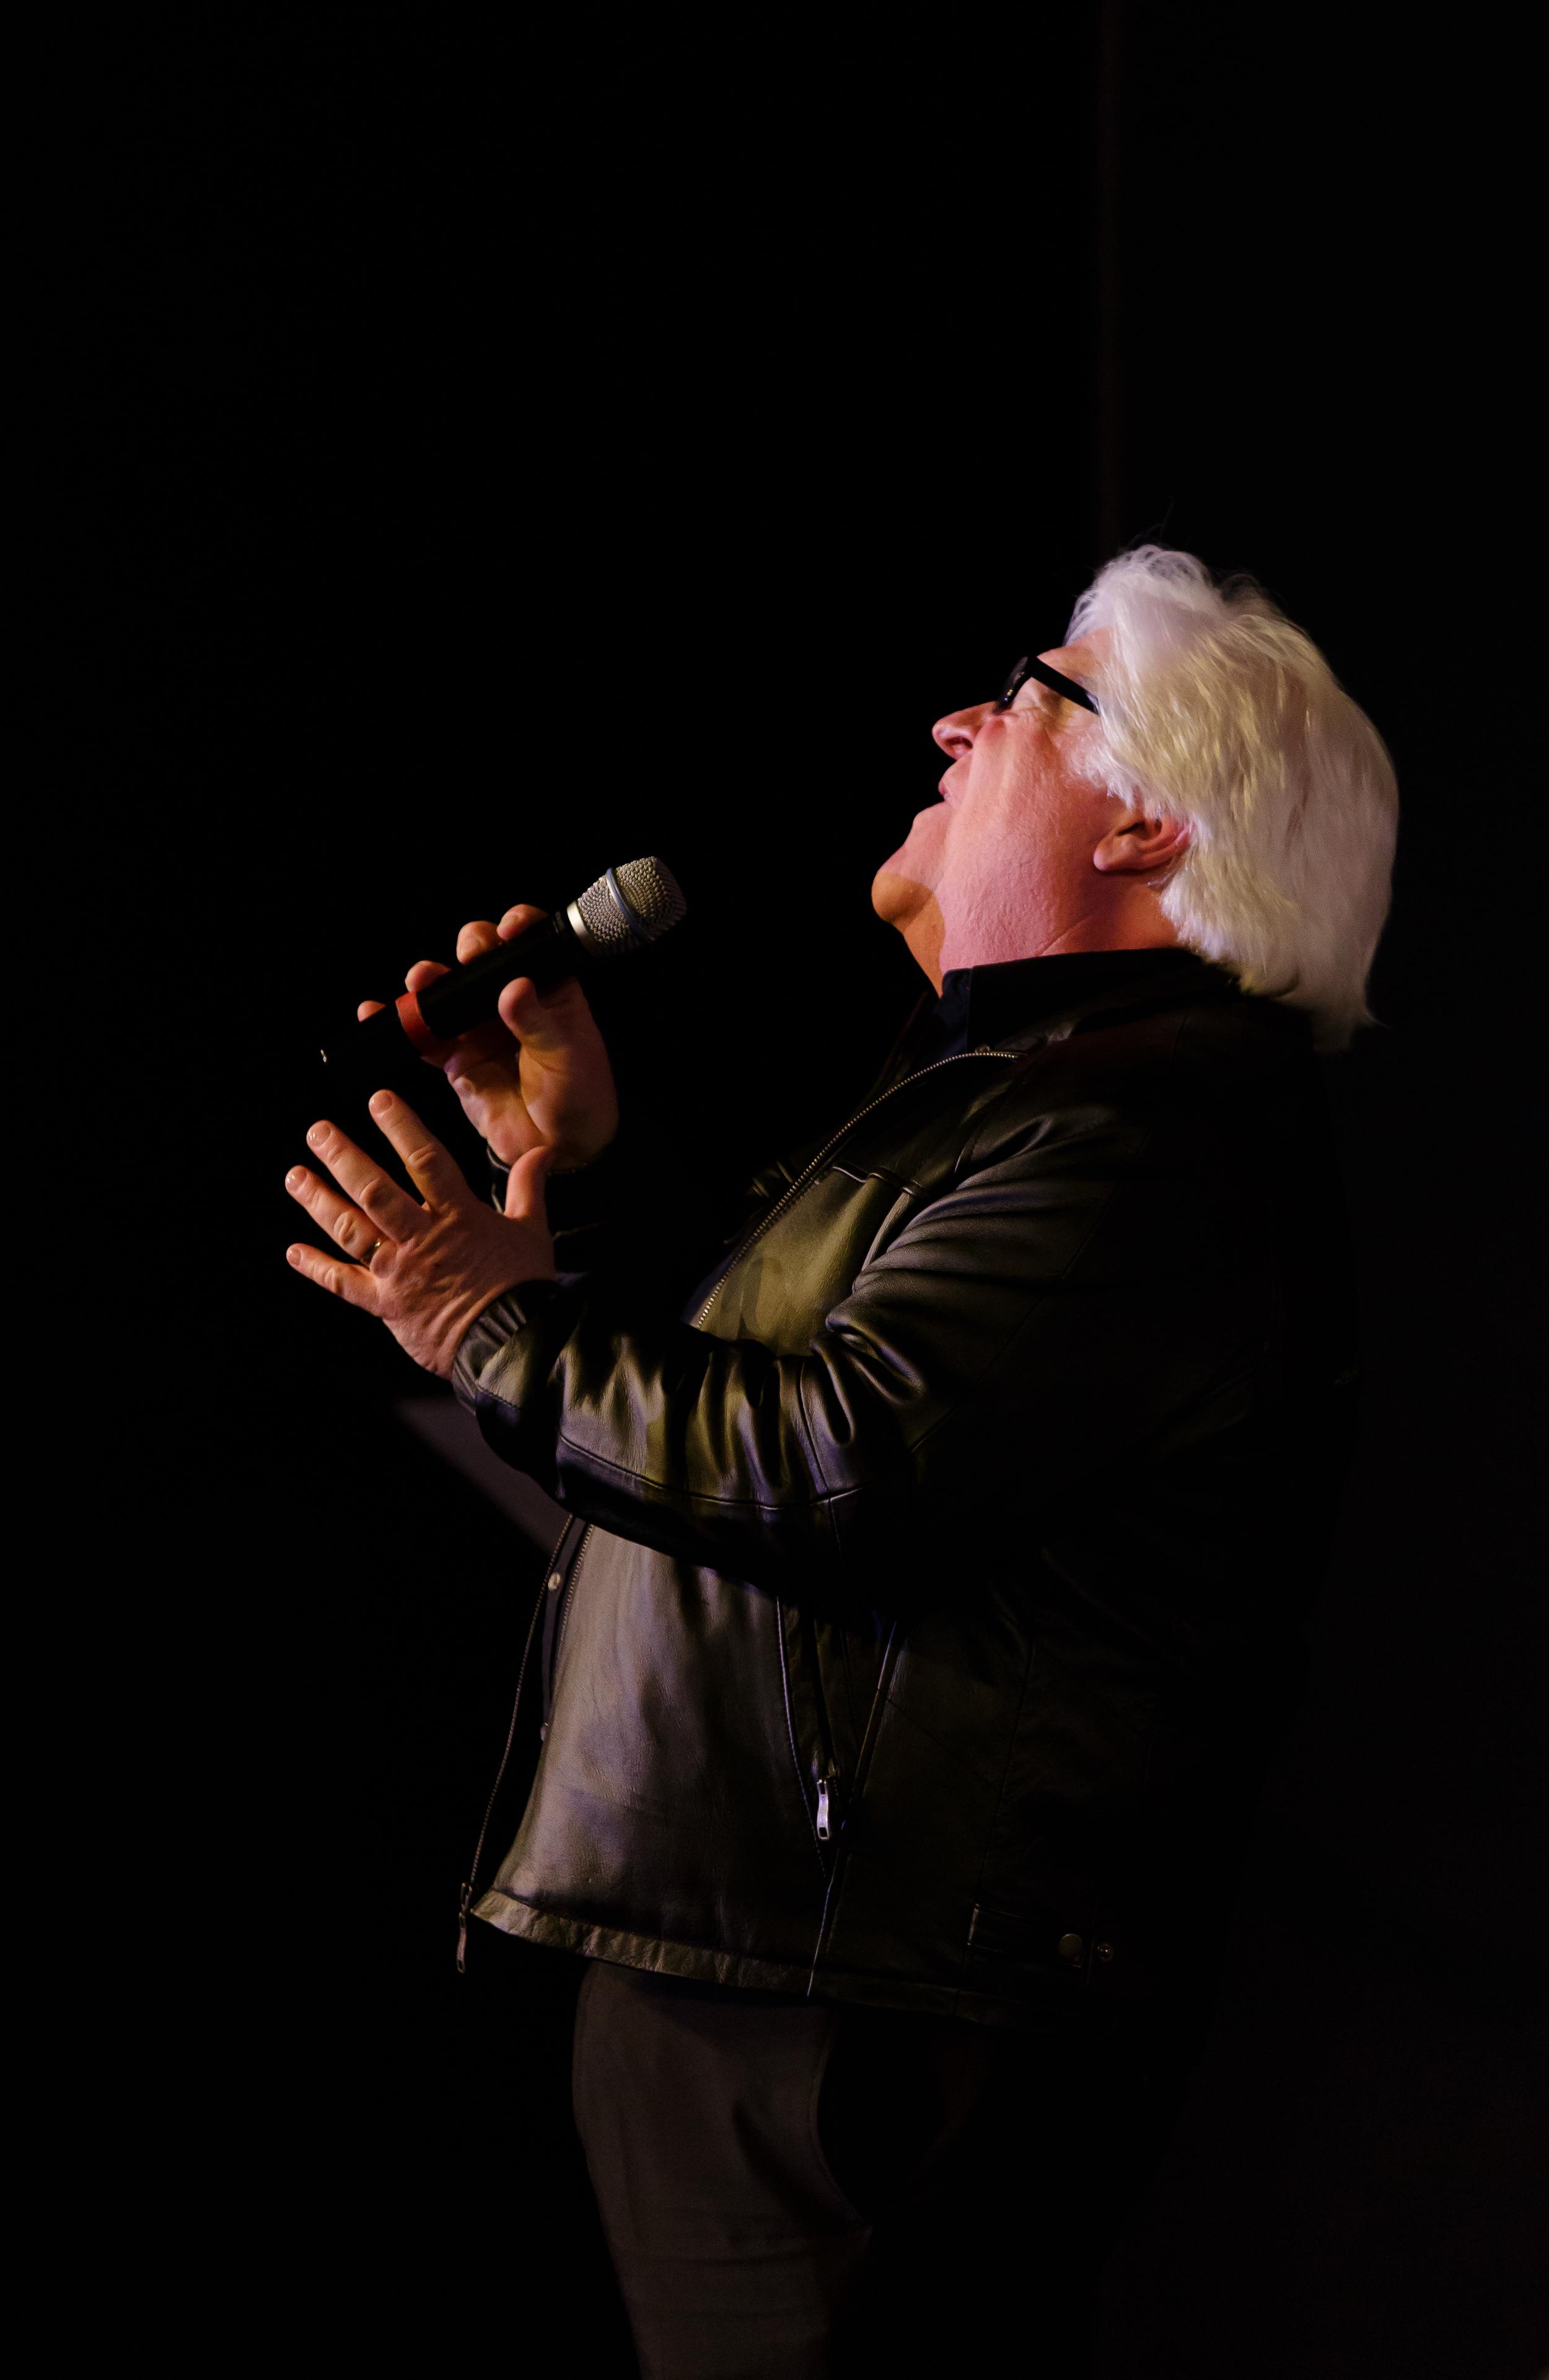 Steve Lively, vocalist